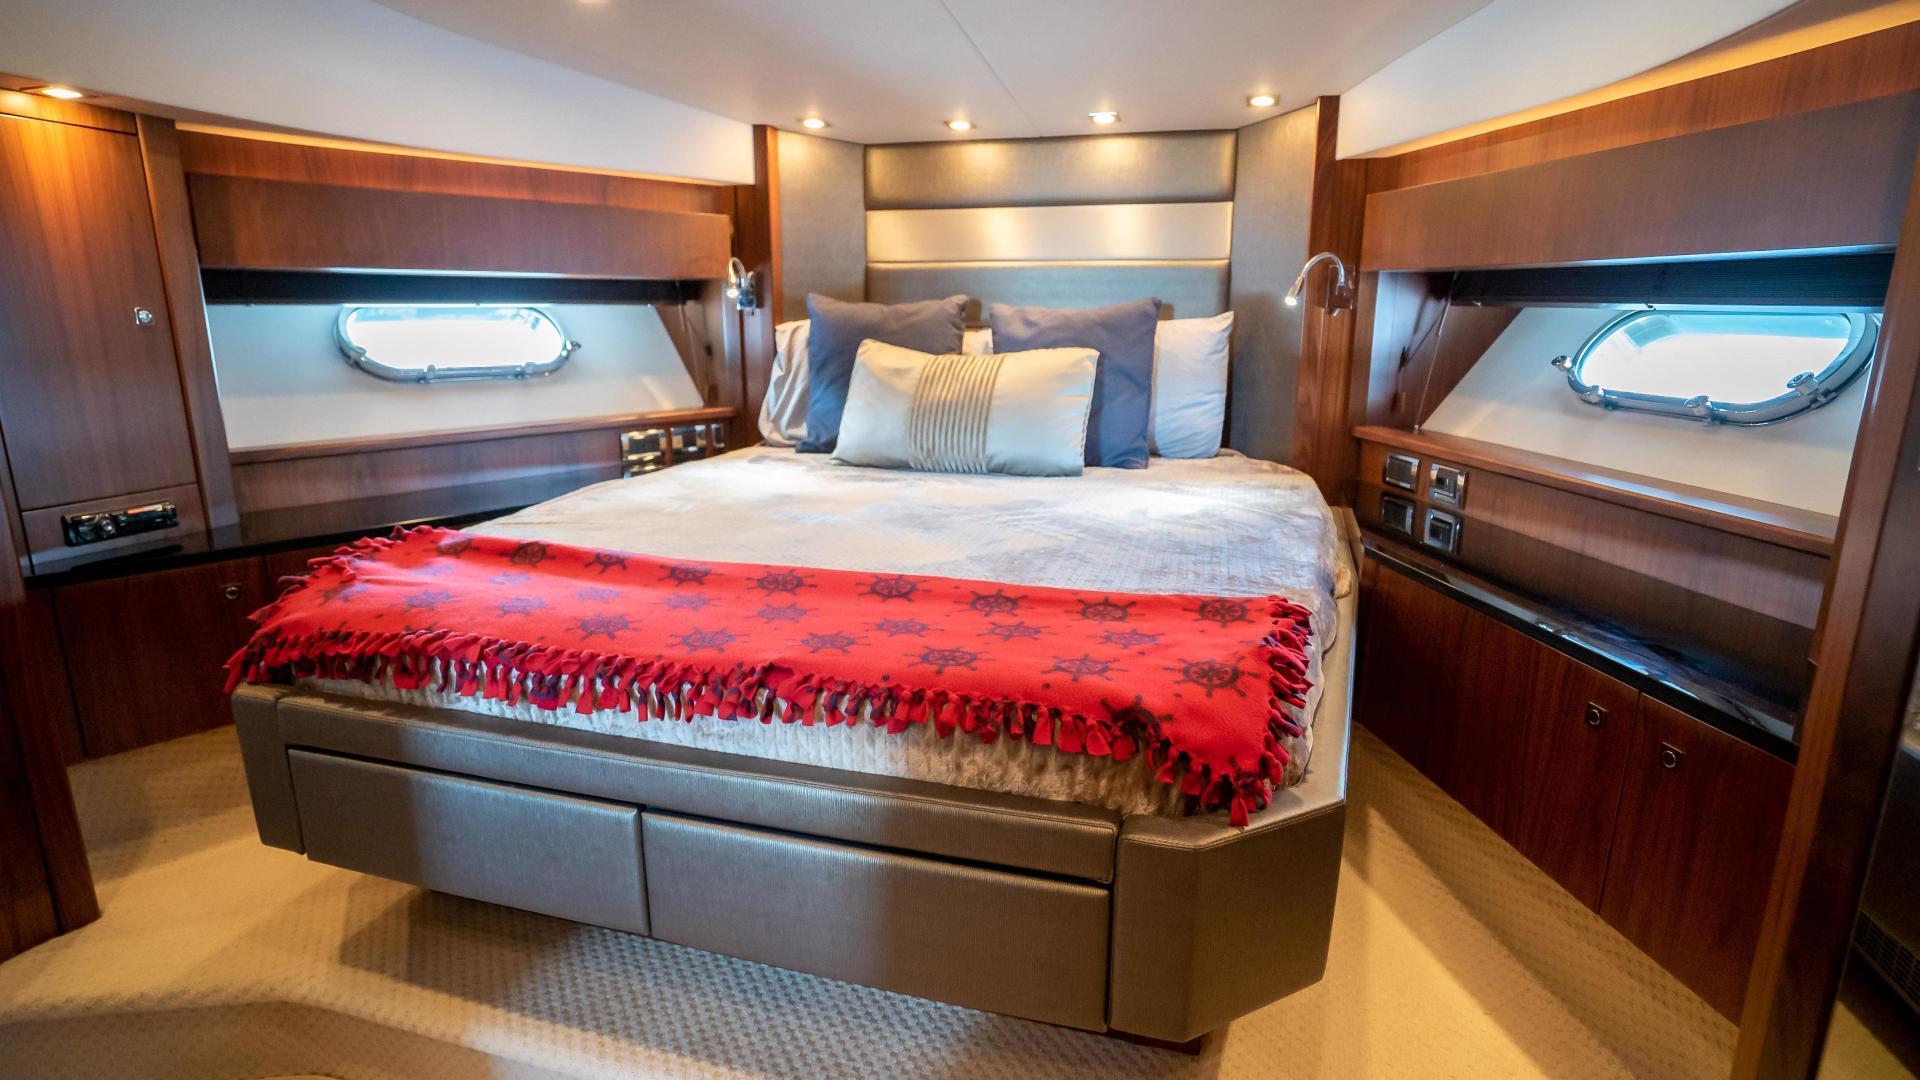 Sunseeker-Motor yacht 2012-JIMBO New Port-Rhode Island-United States-1480201   Thumbnail